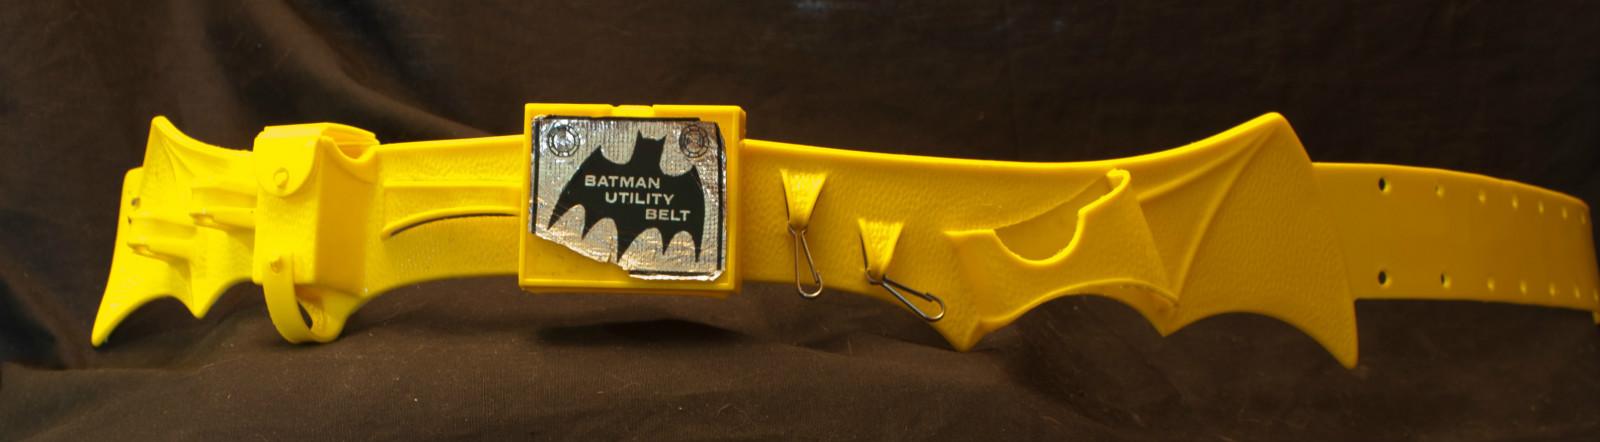 Bat Brick Batman Tool : The bat channel s batman utility belt by ideal